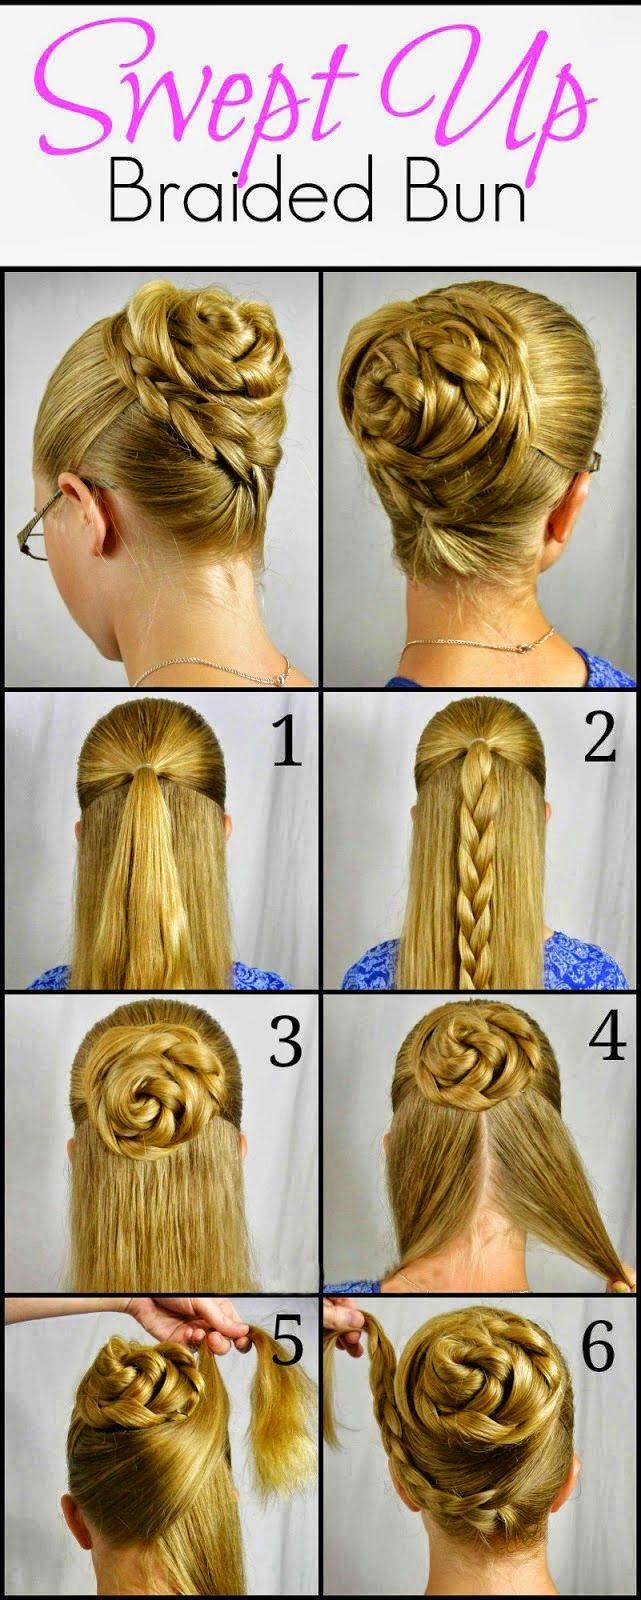 Rose Braid Bun Hairstyle Step By Step Girly Island Hairstyle